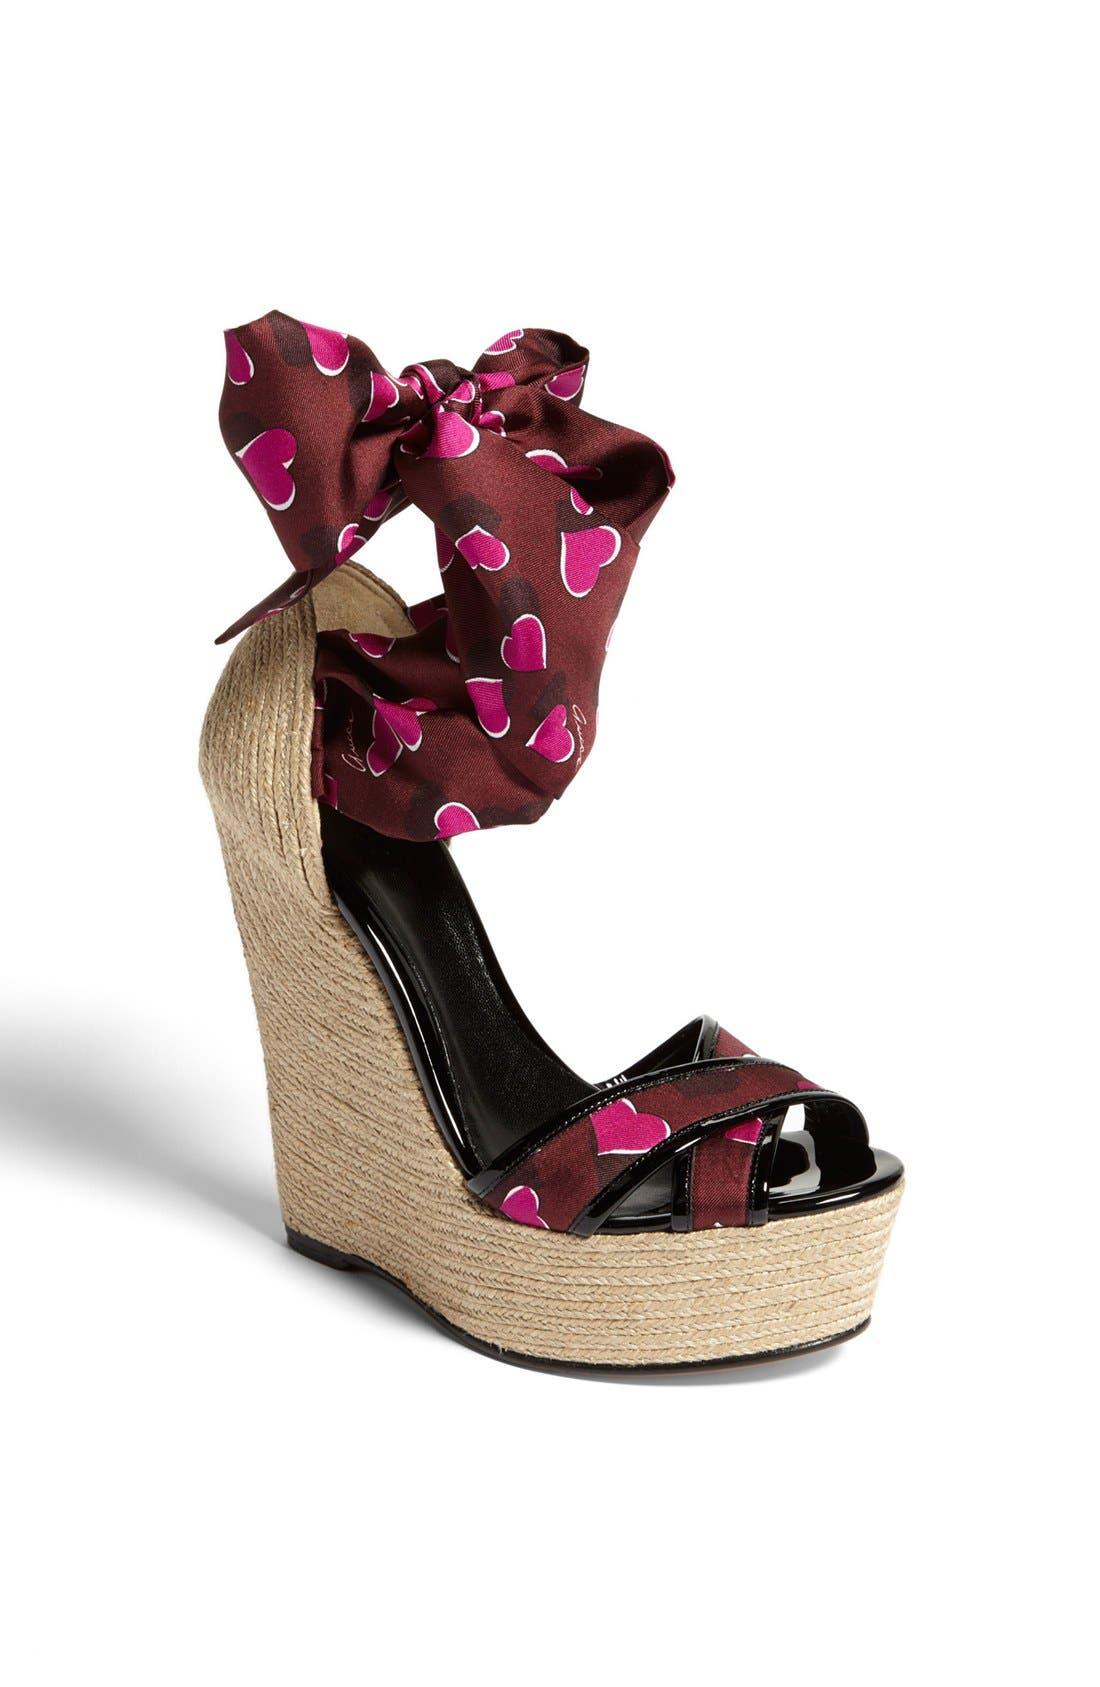 Main Image - Gucci 'Carolina' Print Espadrille Wedge Sandal